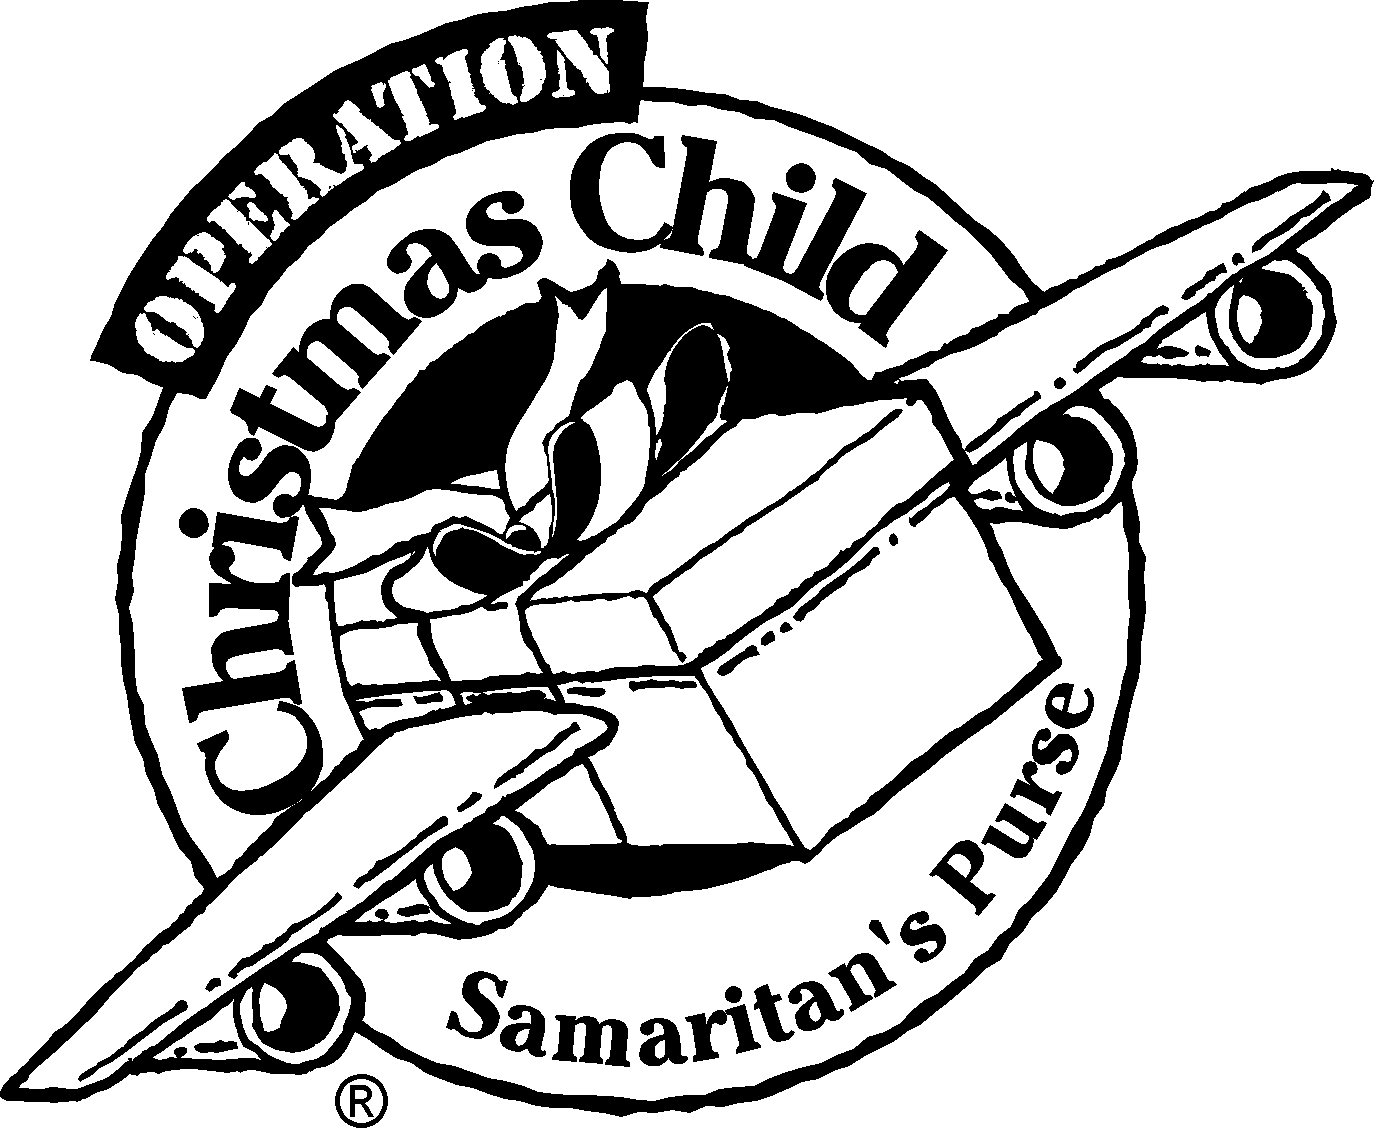 Operation Christmas Child Logo.Operation Christmas Child Logos